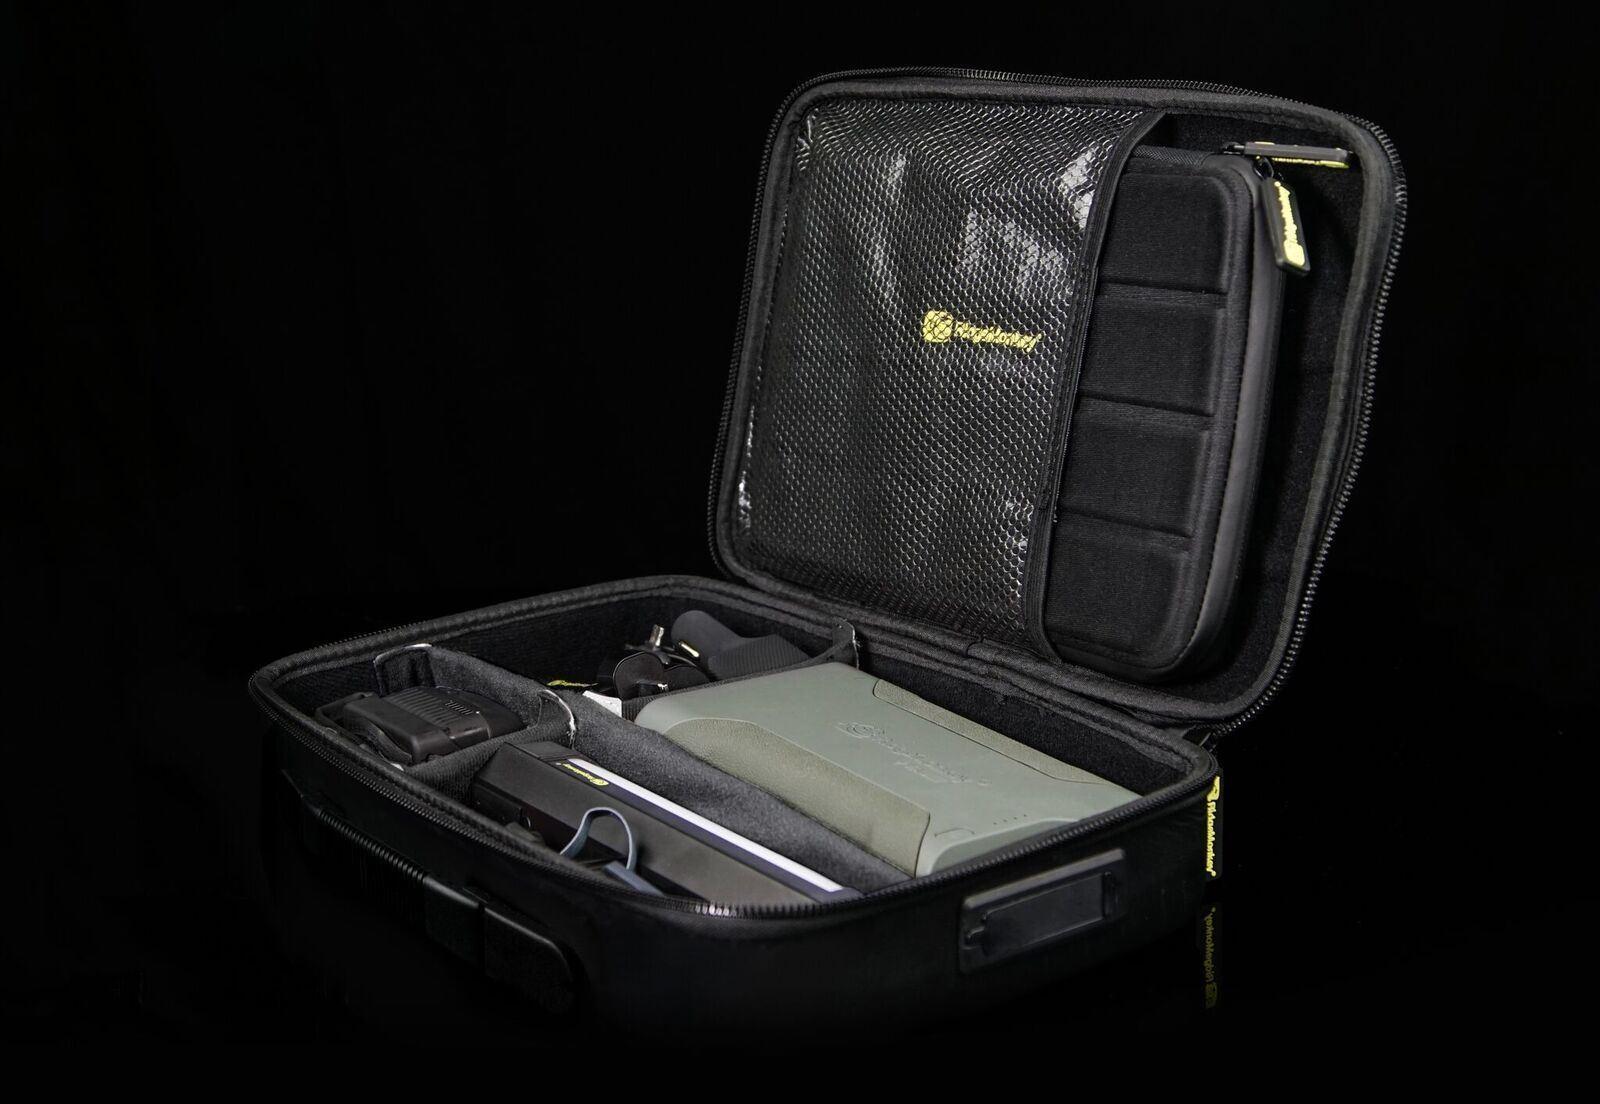 Ridgemonkey Gorillabox Tech Custodia 370 - per Vault 42150, Tenda Leggero &